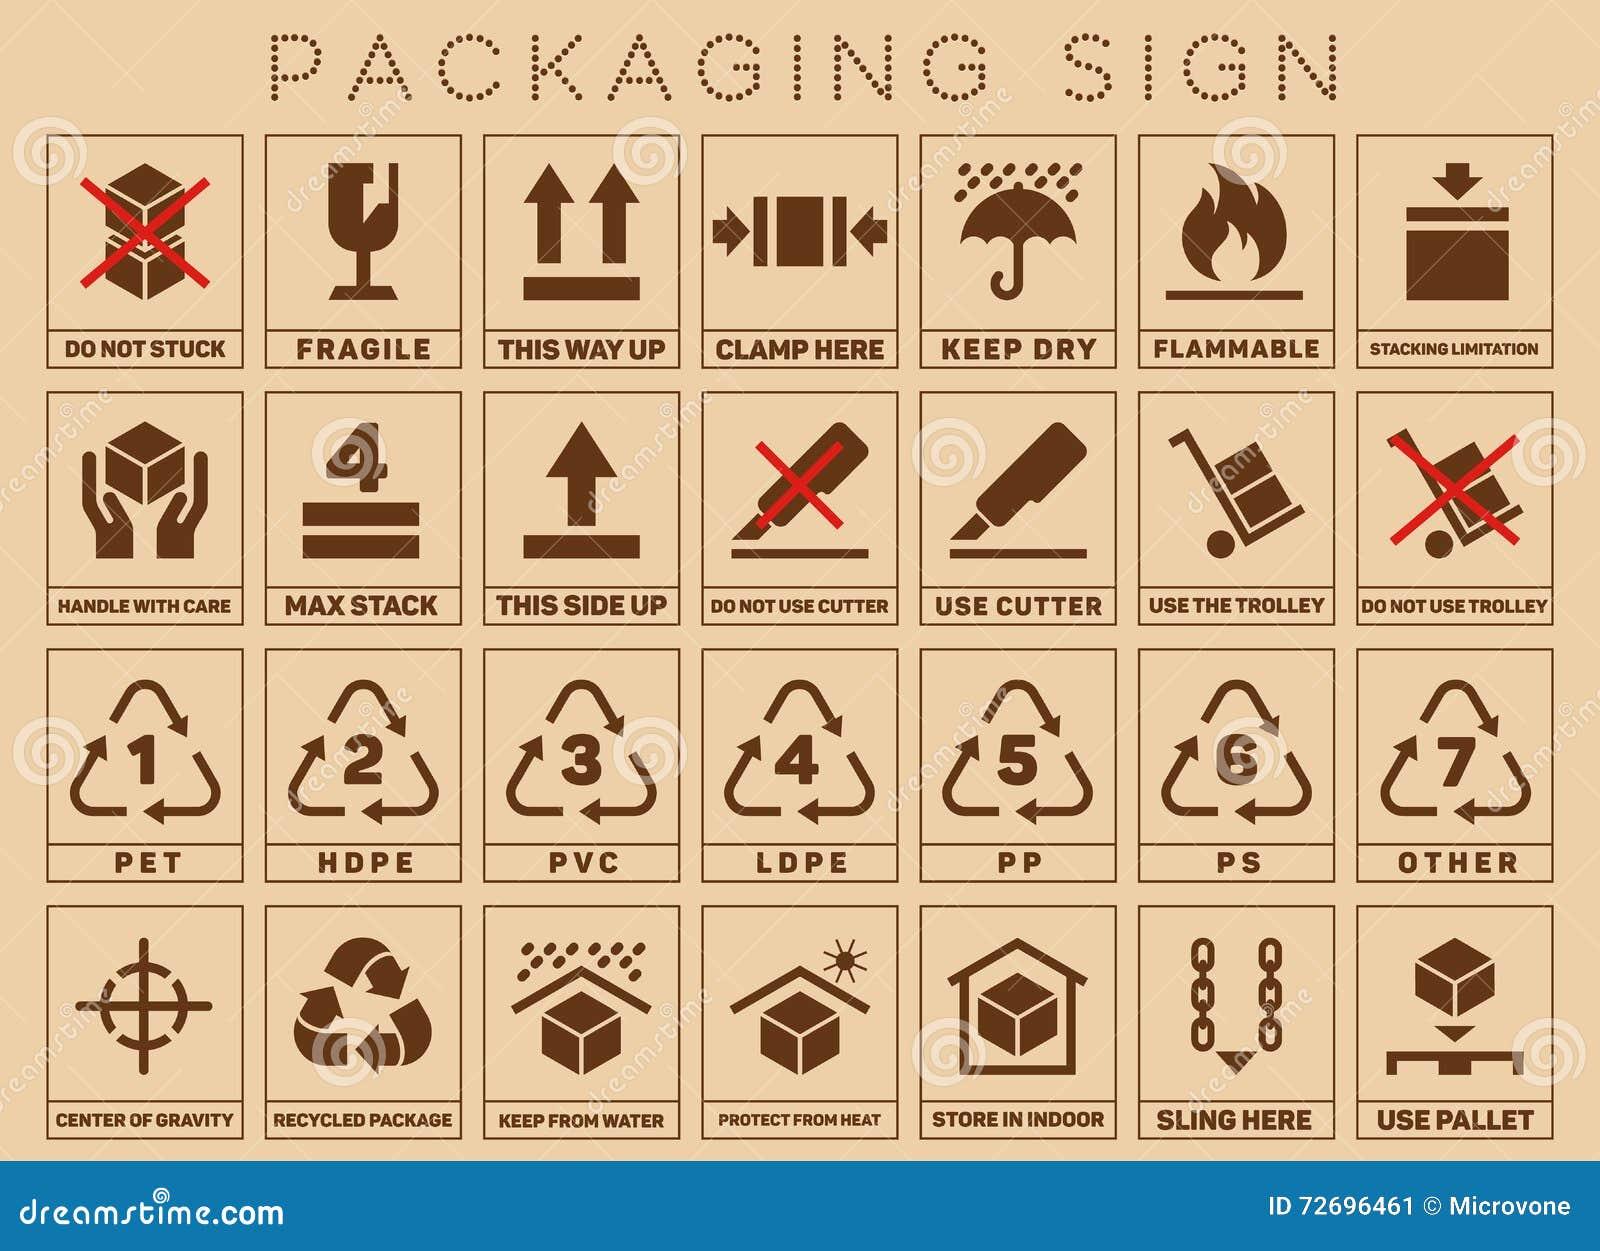 Caution symbols carton box stock illustrations 30 caution symbols packaging sign or symbols packaging signs or packaging symbols packaging symbol standard and care biocorpaavc Choice Image